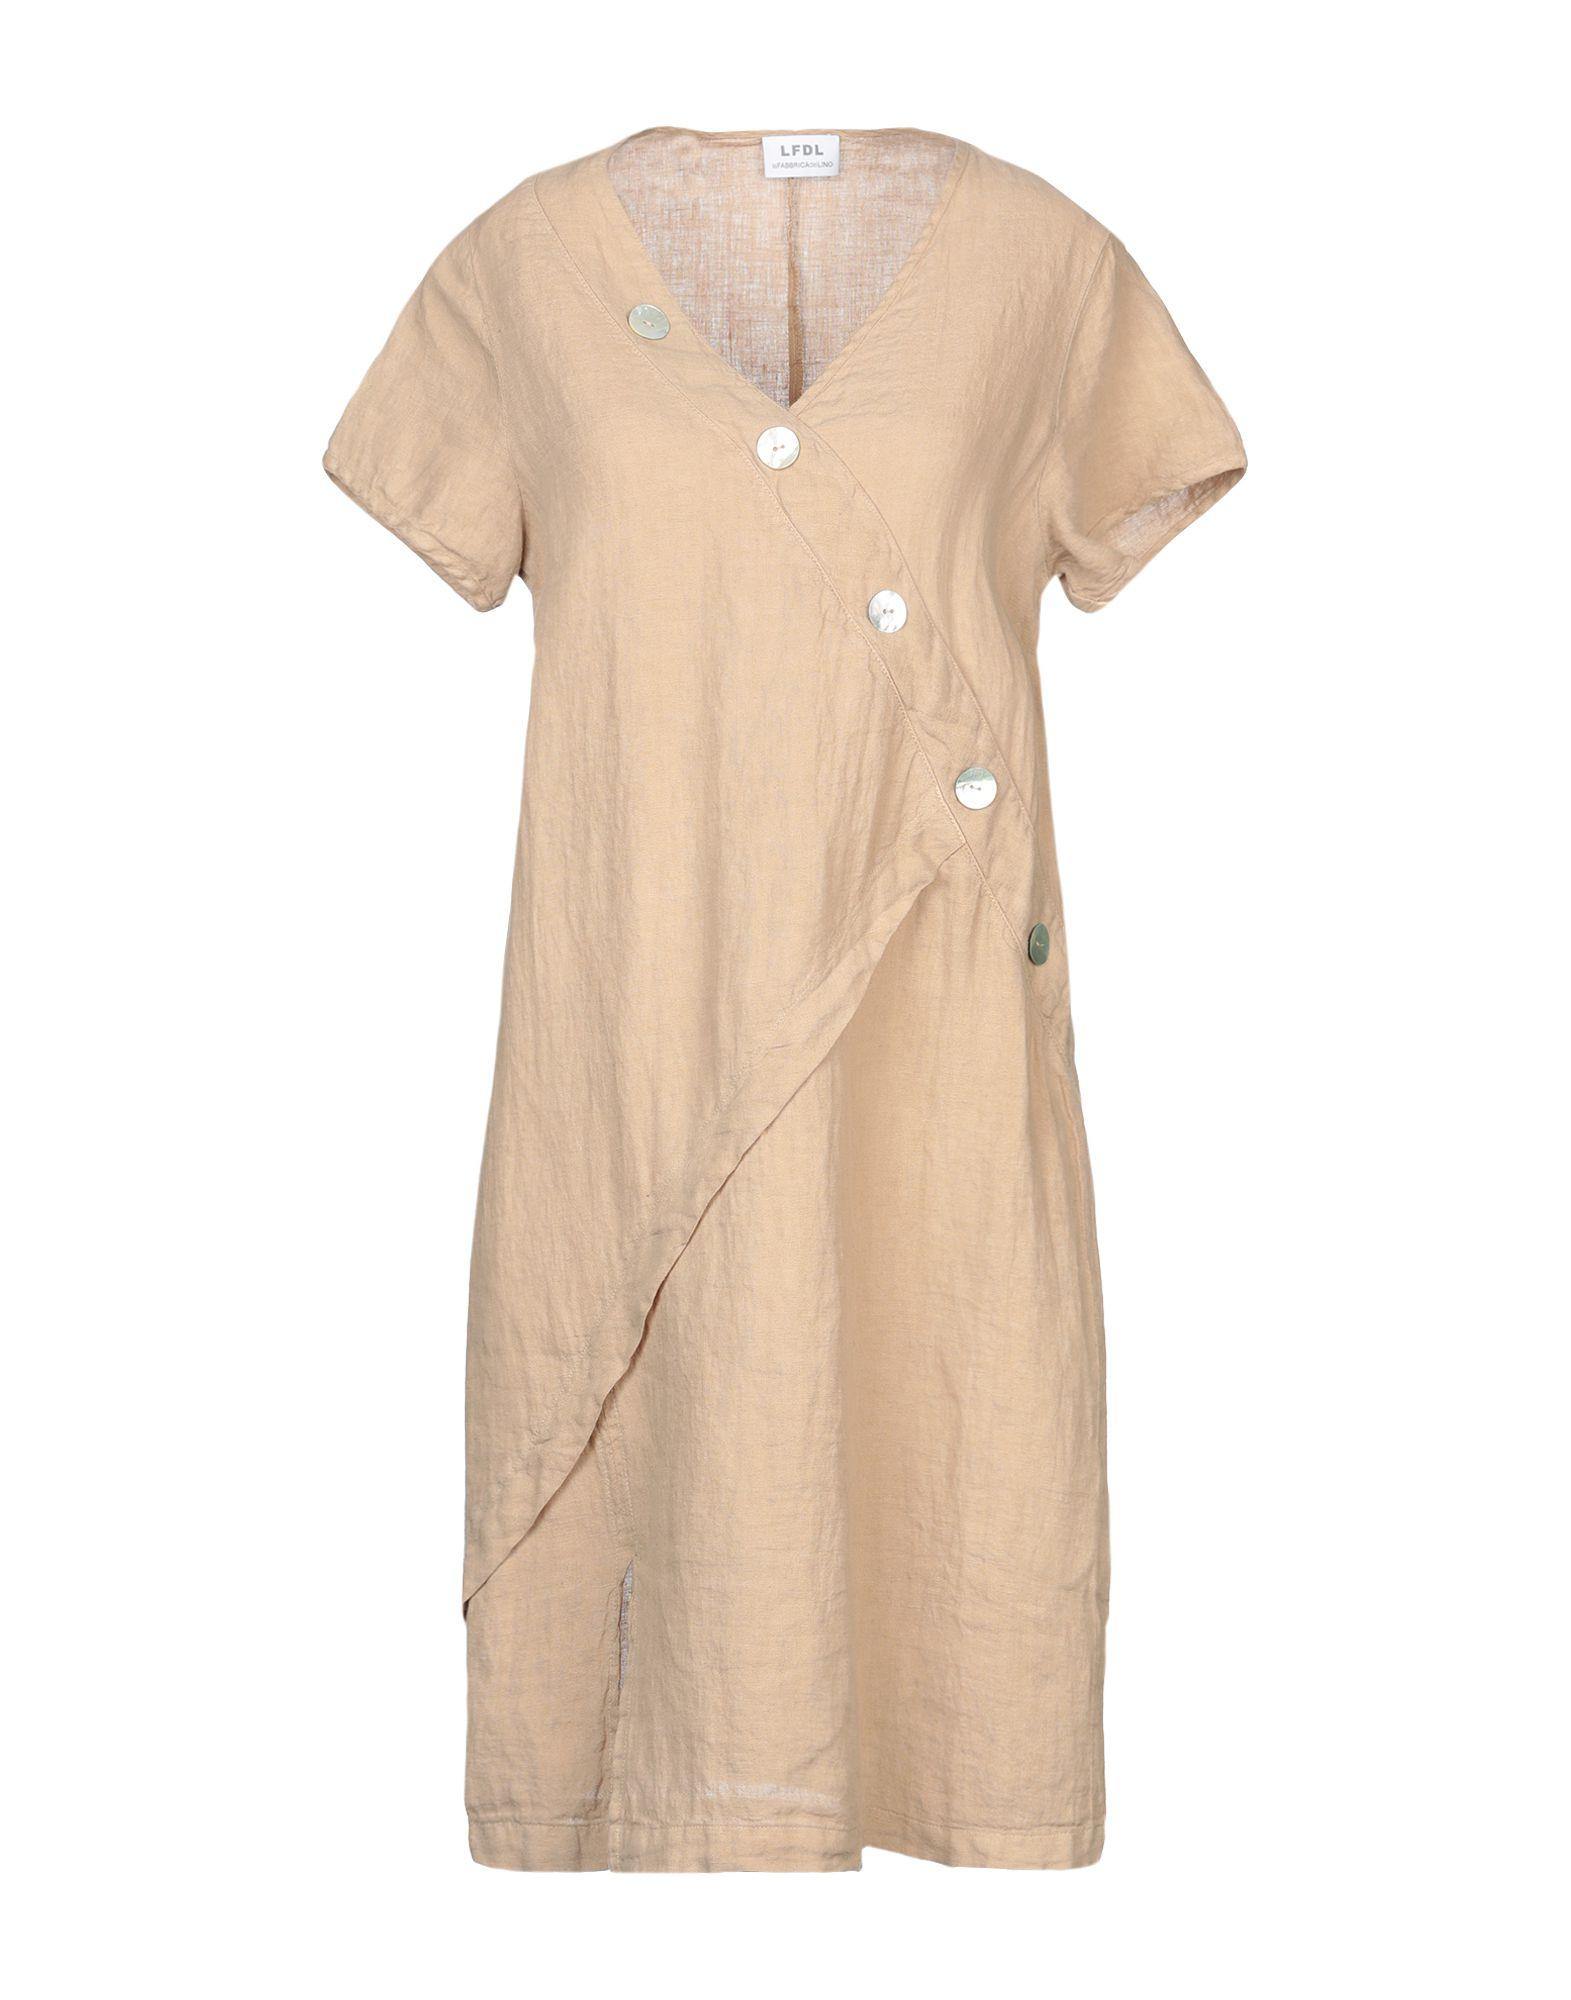 LFDL LA FABBRICA DEL LINO Короткое платье magazzini del sale короткое платье